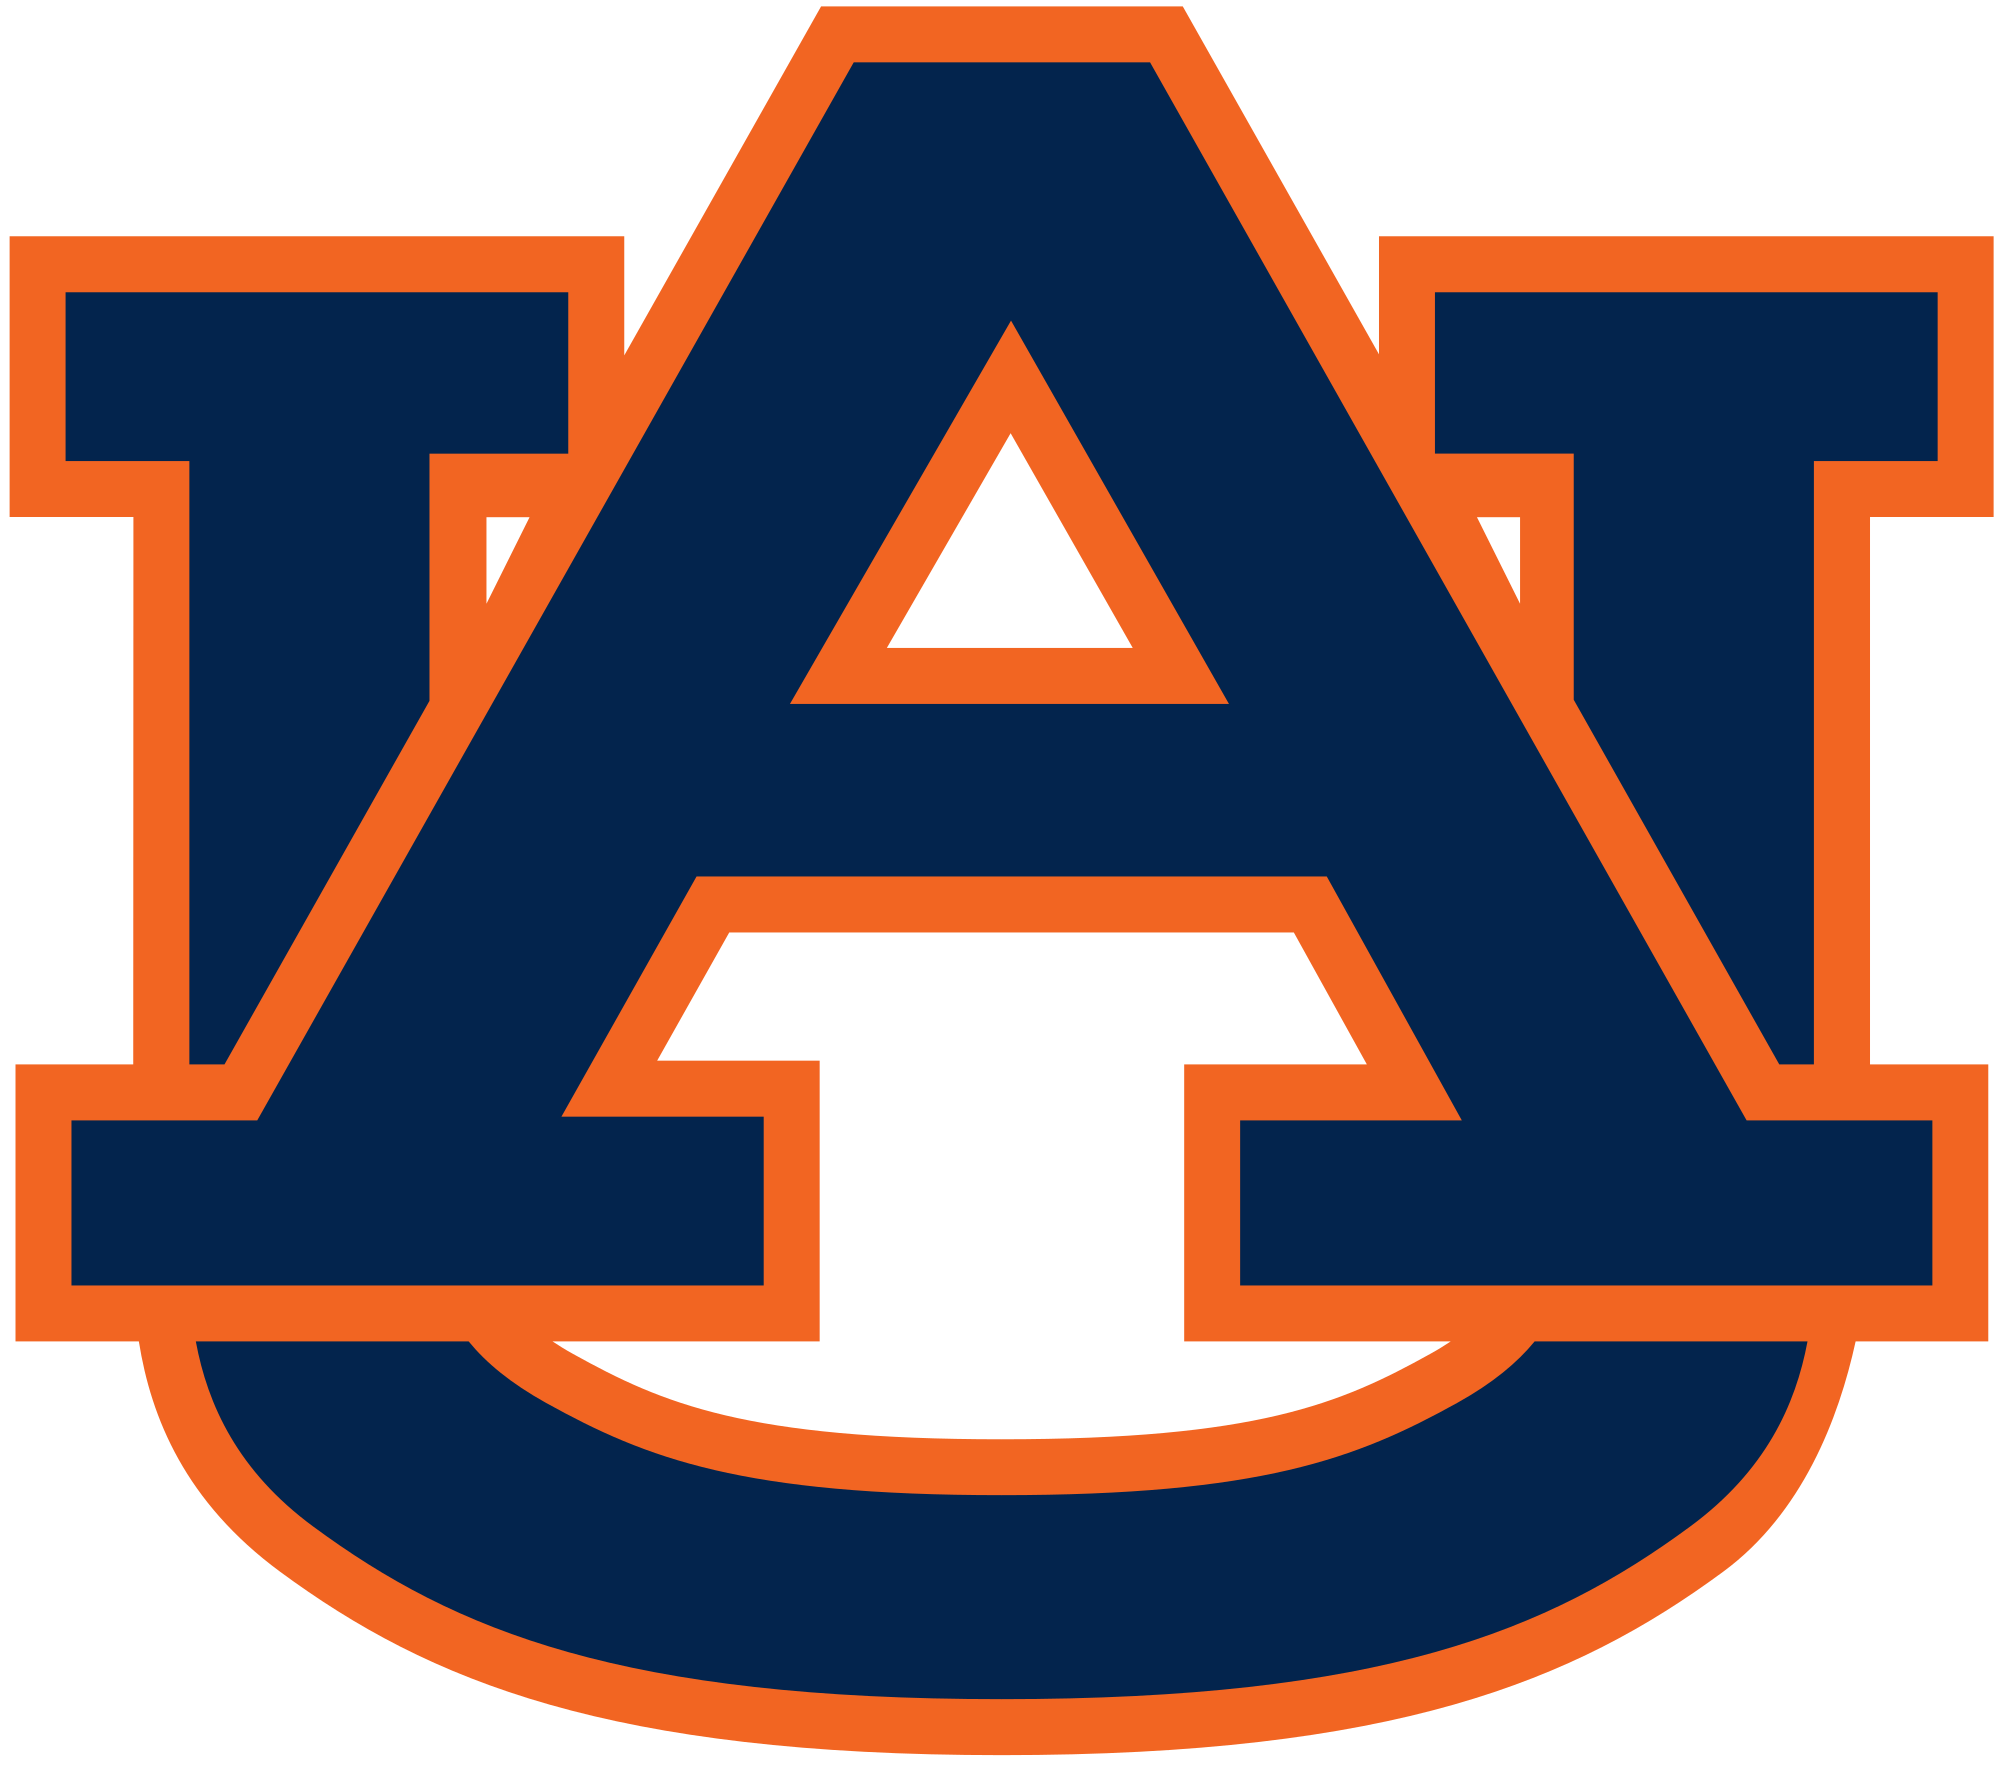 Auburn football clipart banner freeuse stock Auburn Football Logo Pictures - Alternative Clipart Design • banner freeuse stock